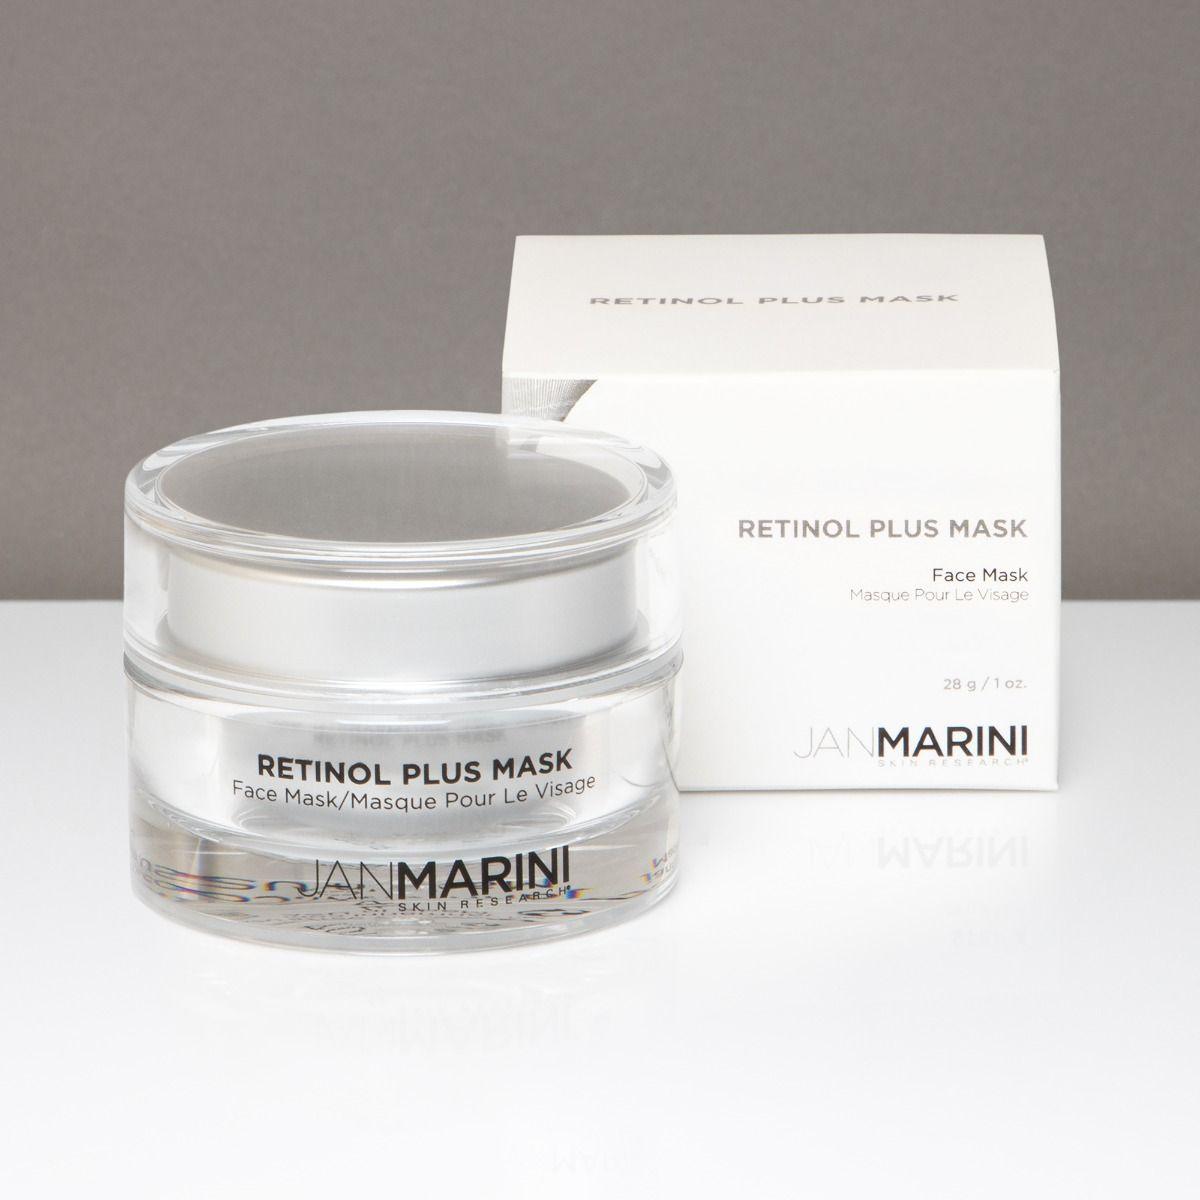 Jan Marini Retinol Plus Face Mask 1